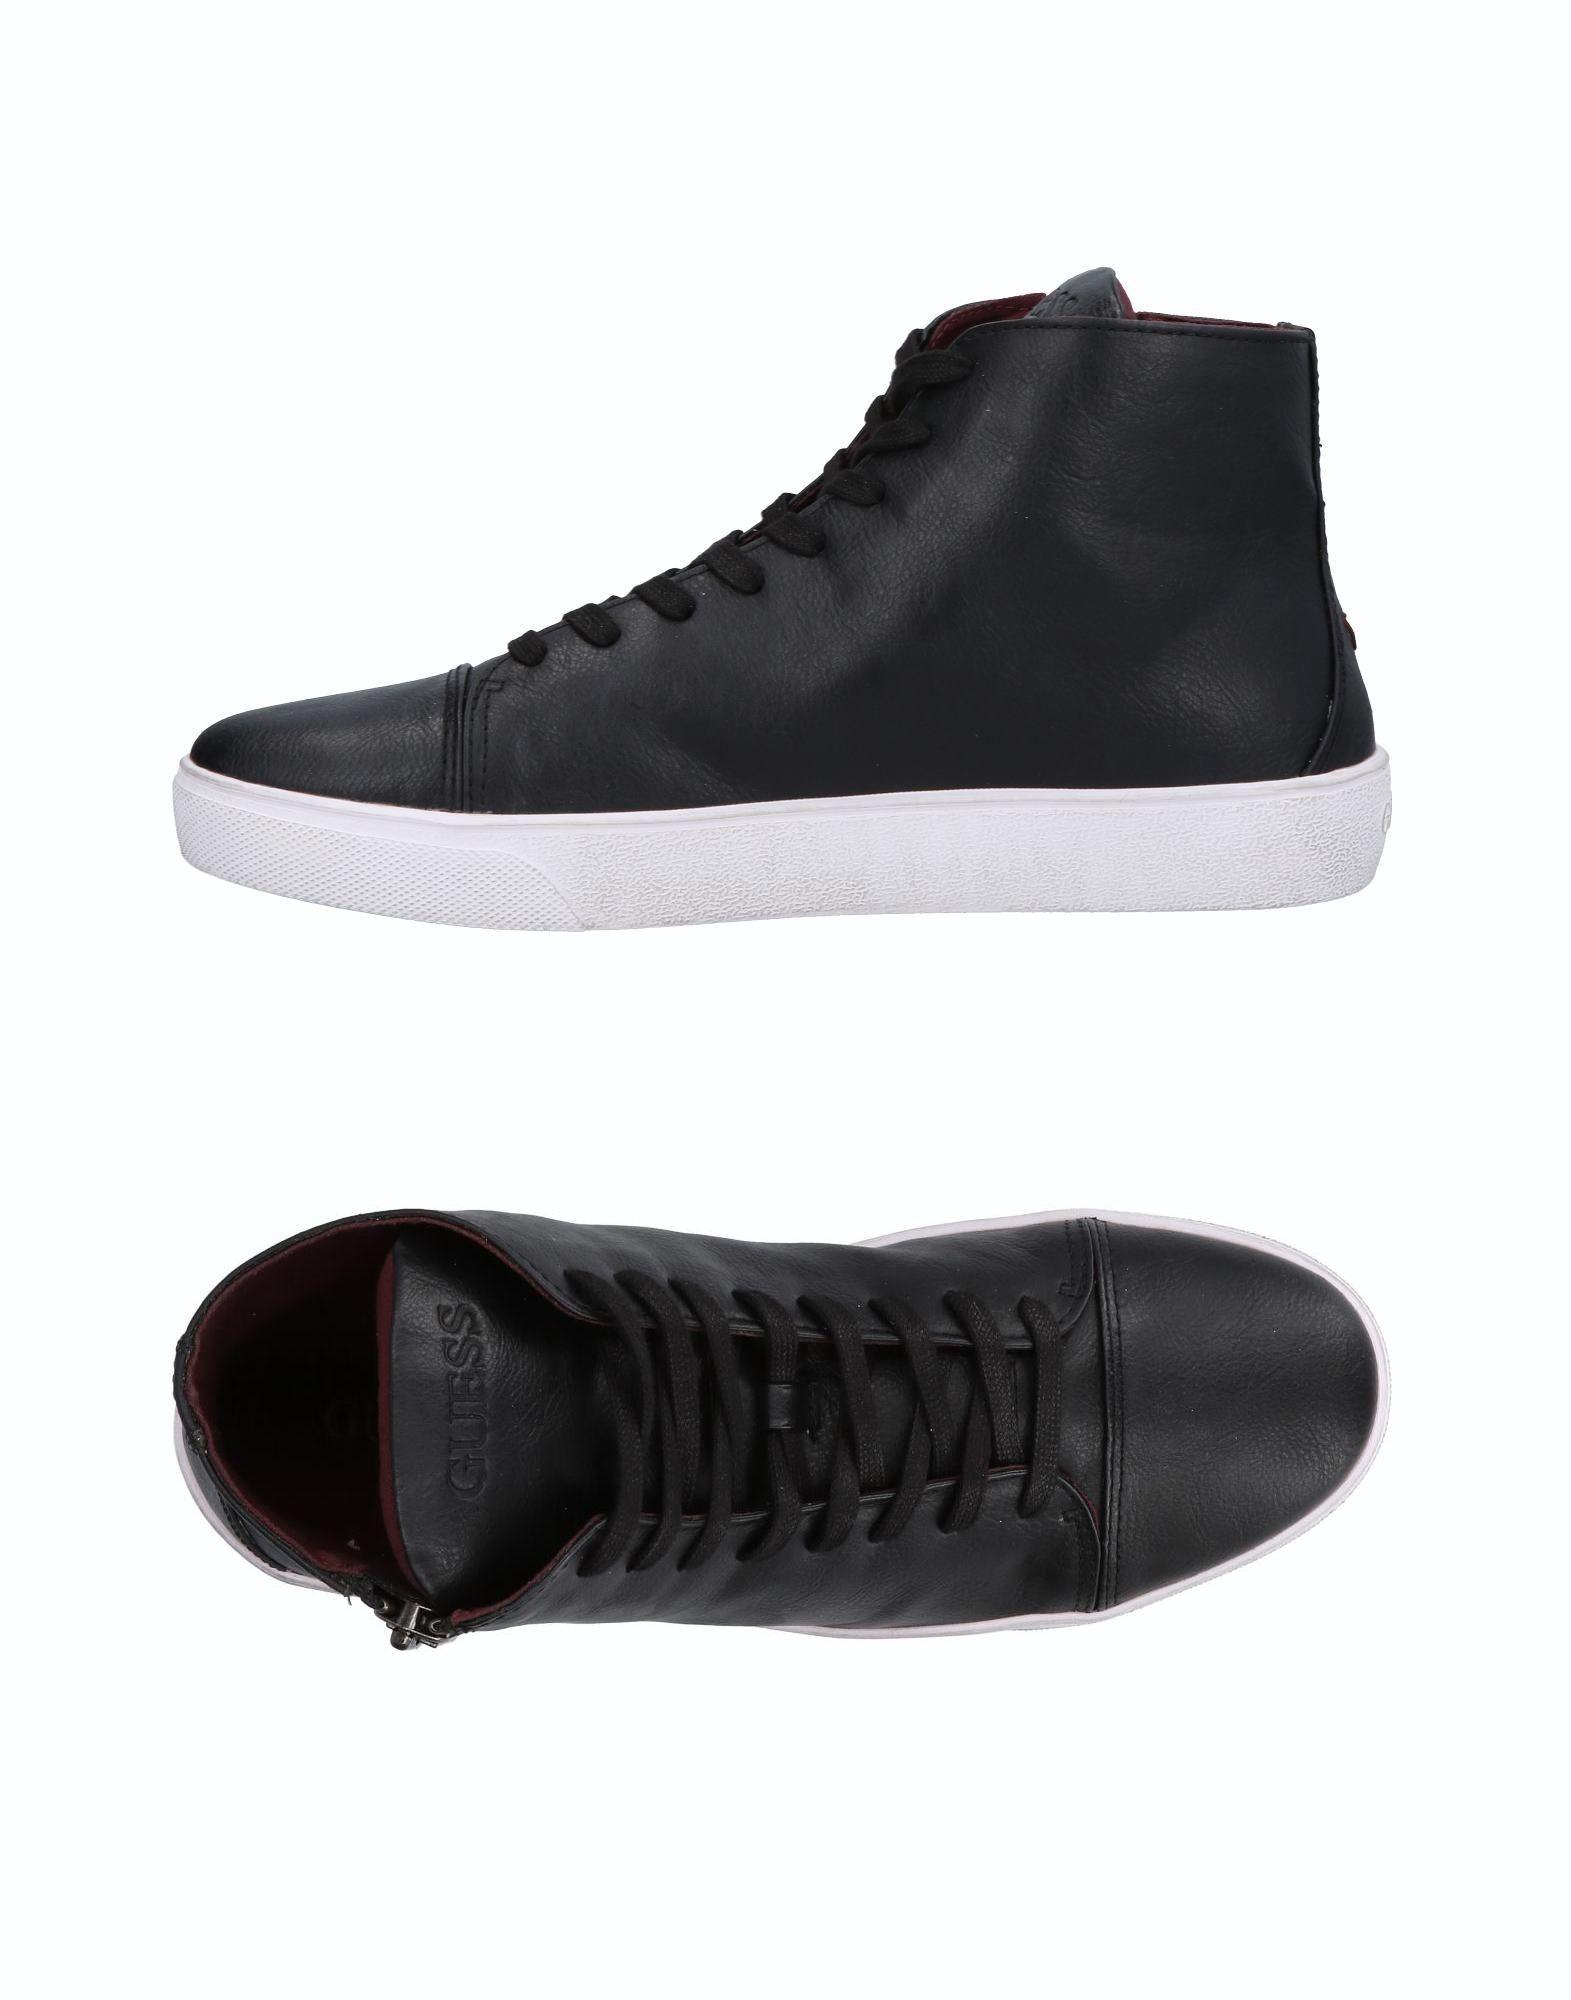 11467191GW Guess Sneakers Herren  11467191GW  cd3bdb